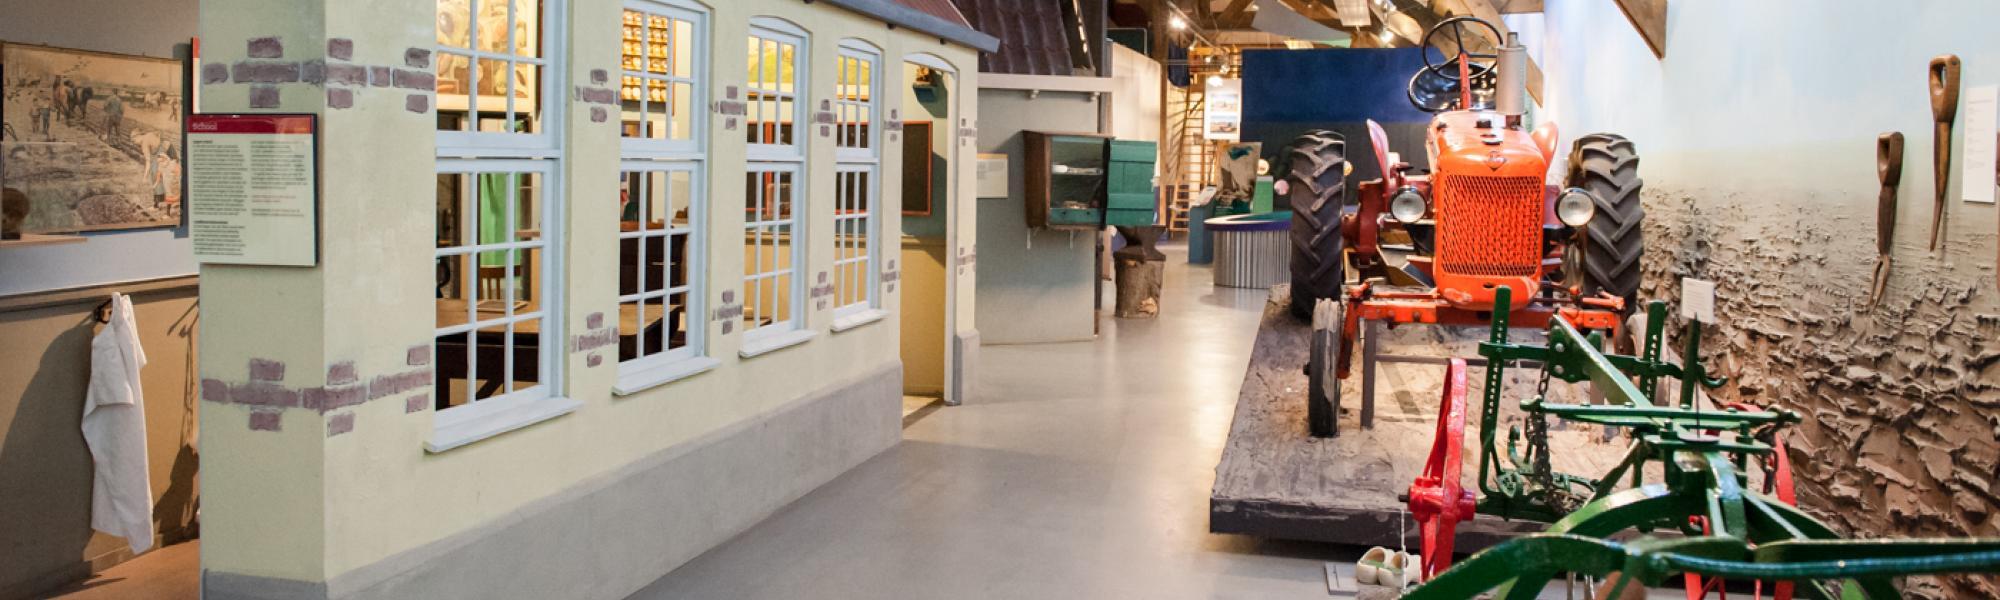 Vaste tentoonstelling Historisch Museum